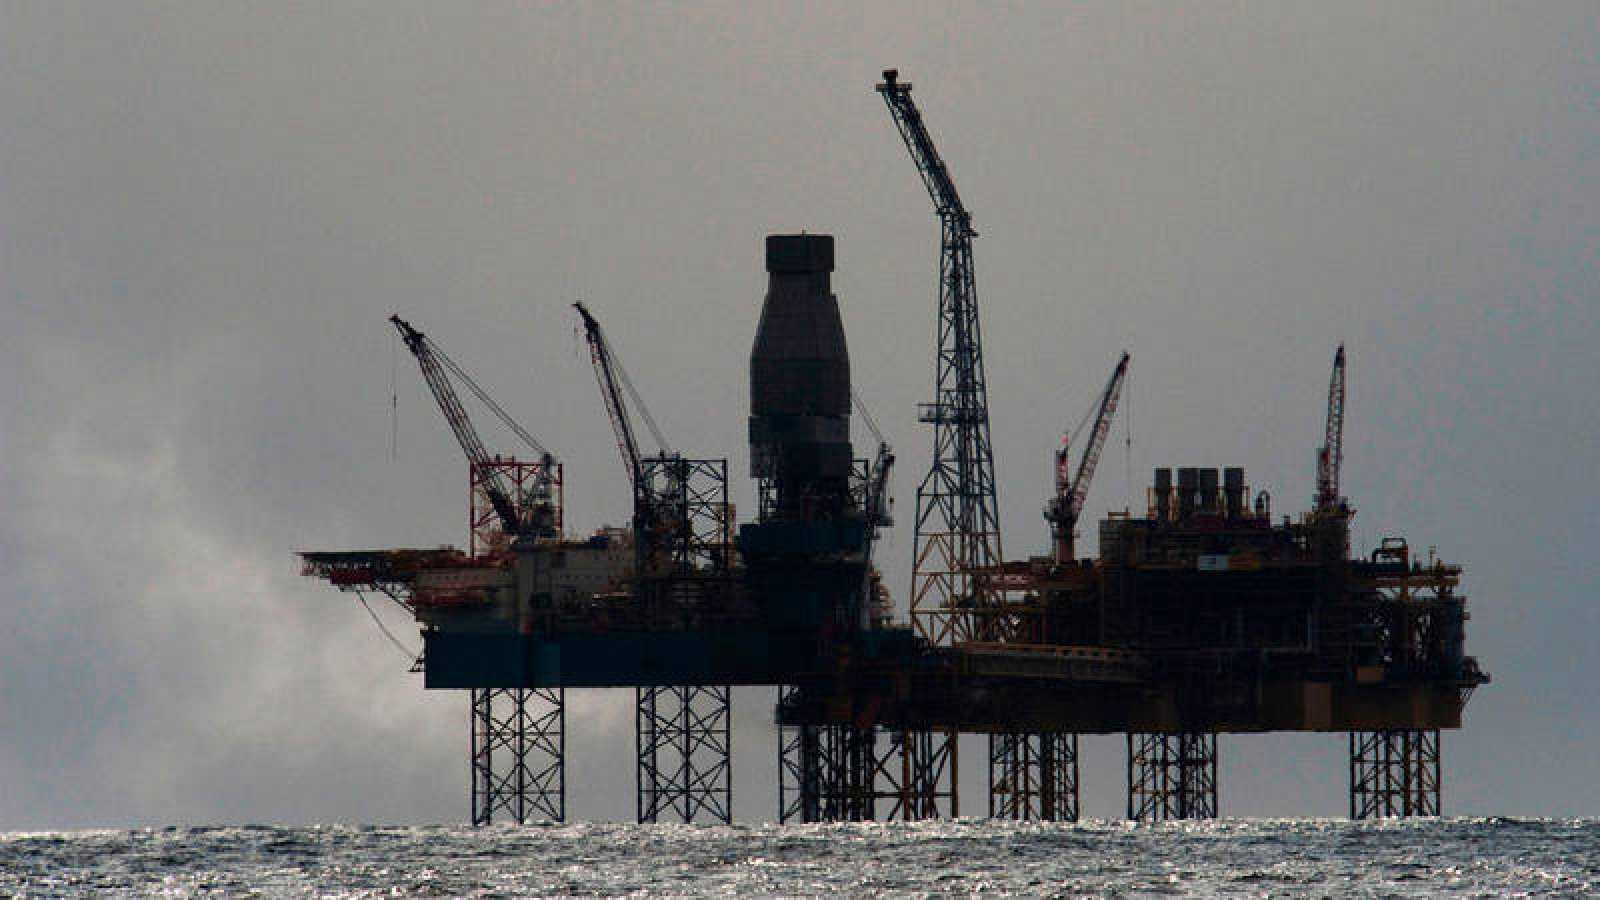 La plataforma Elgin del gigante energético francés Total, a 240 kms de Aberdeen (Escocia), en el Mar del Norte